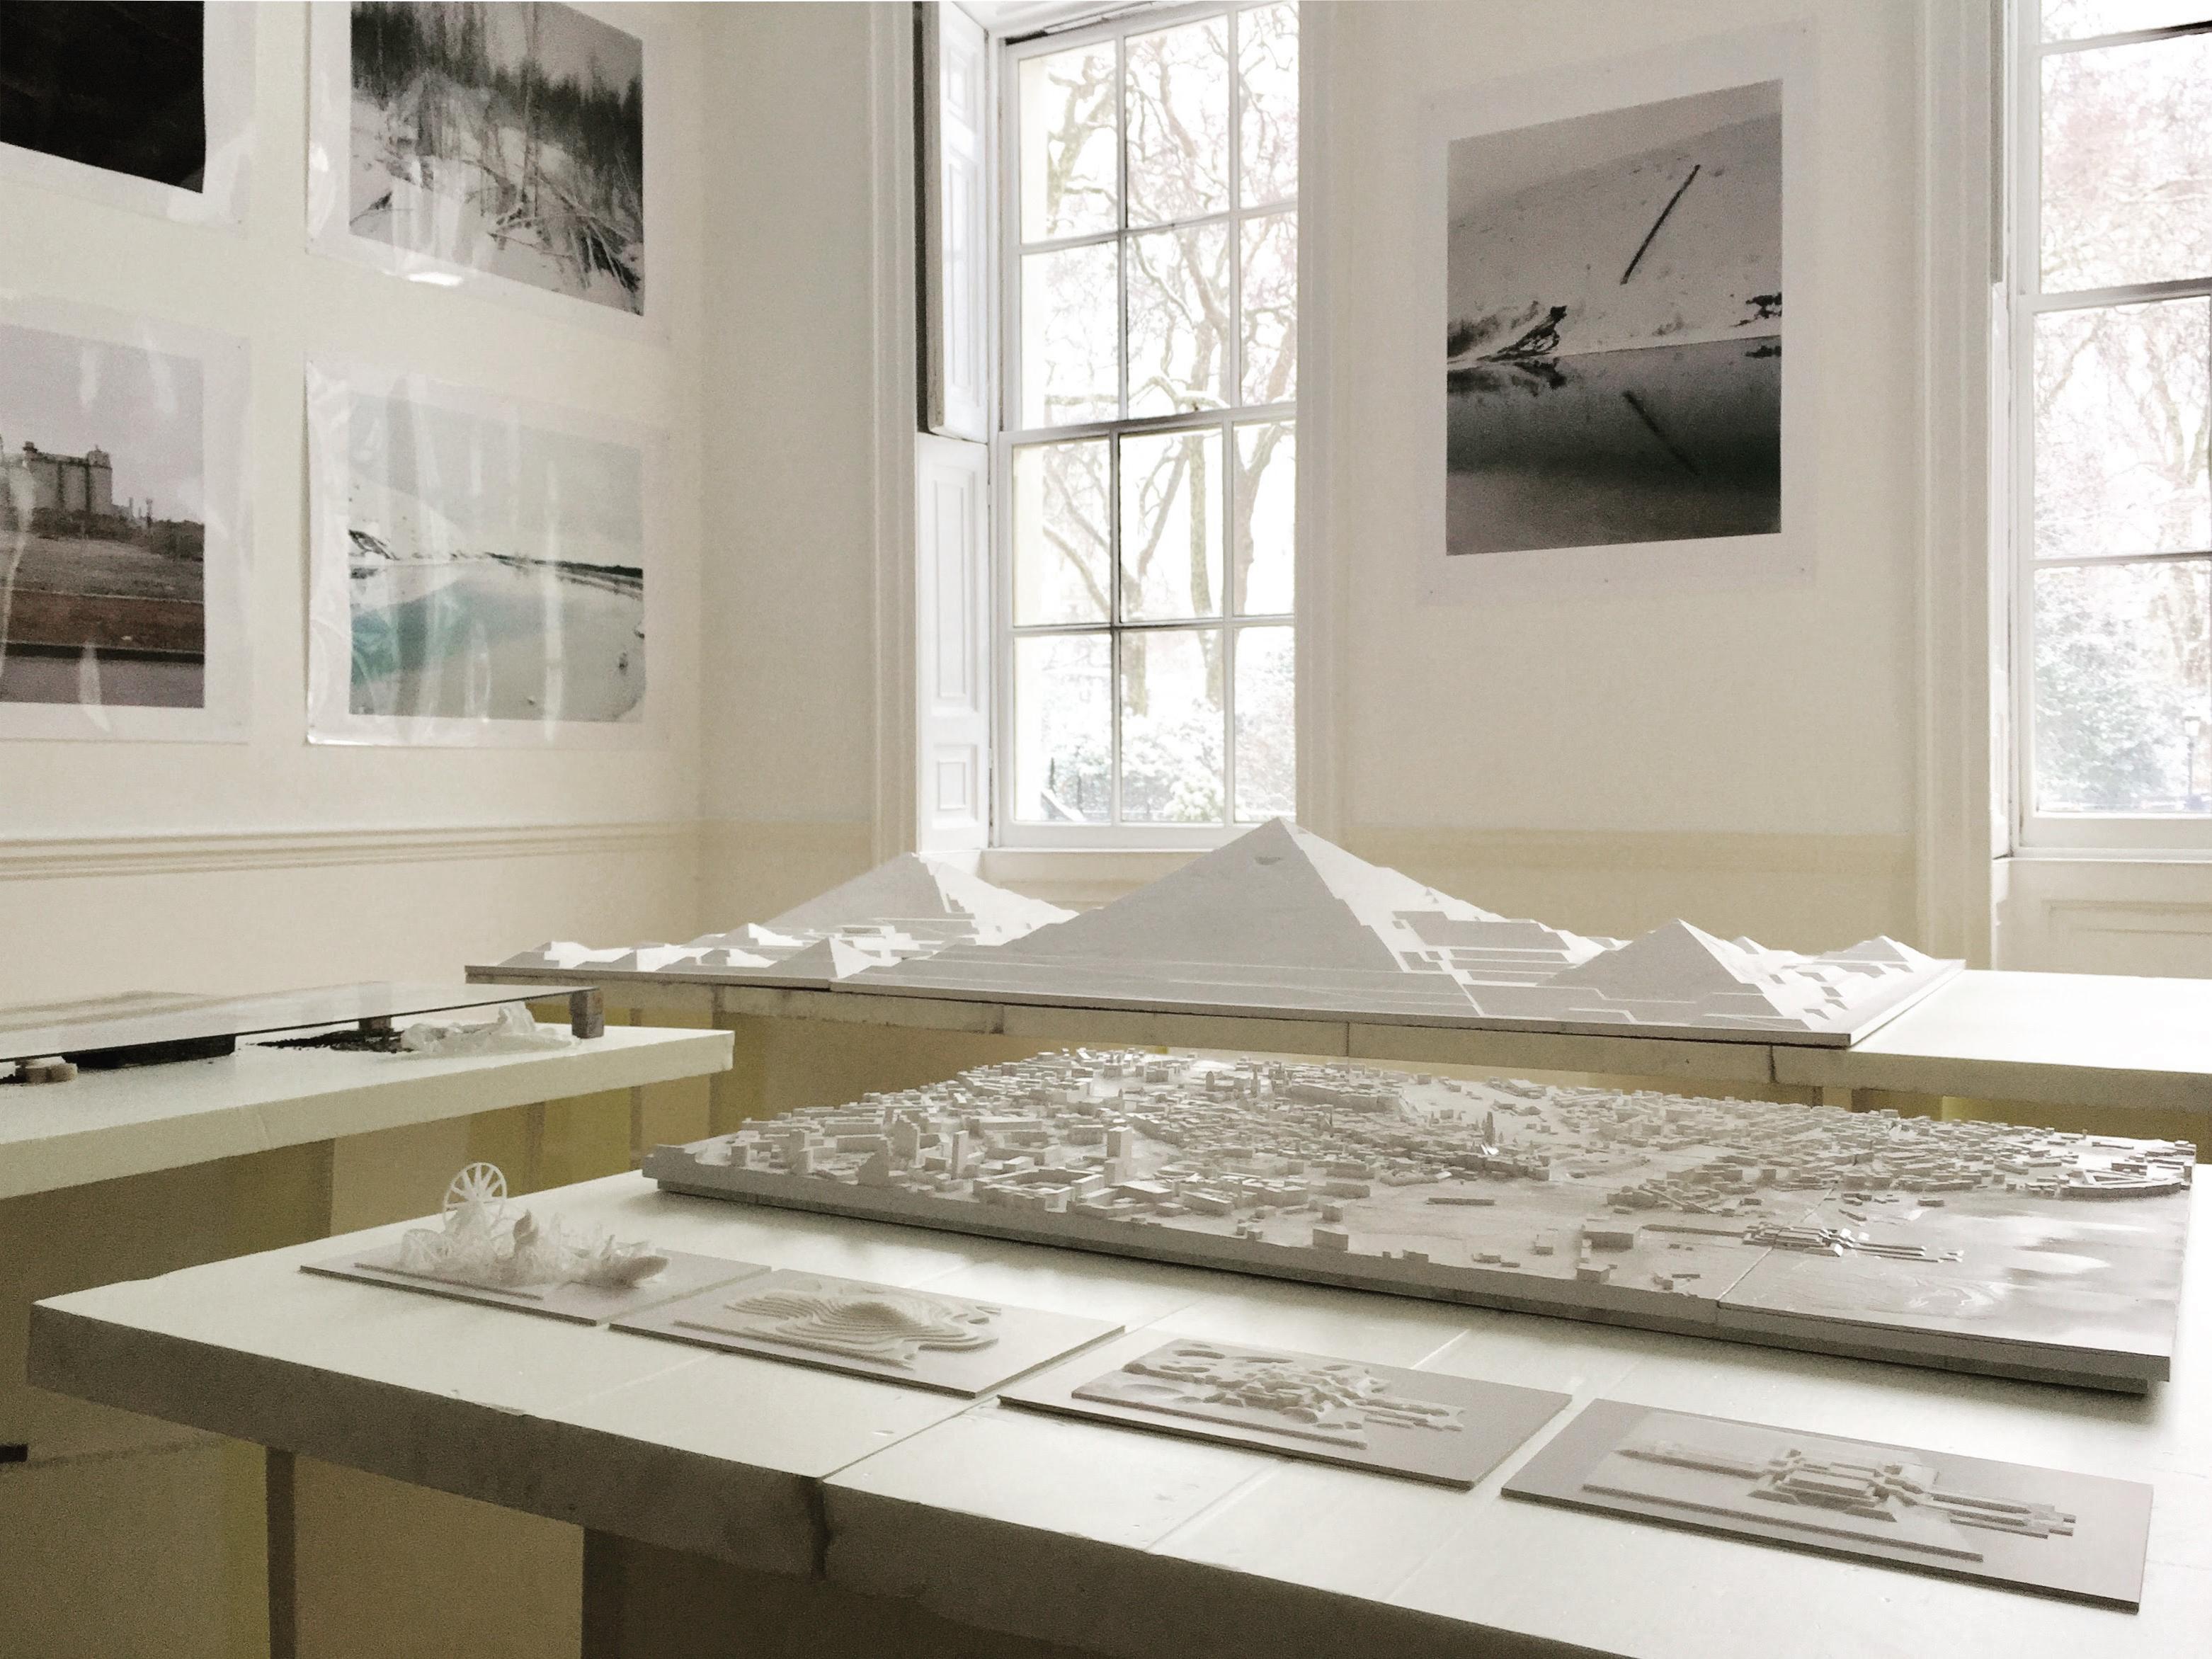 2018 Linnahall exhibit at the AA